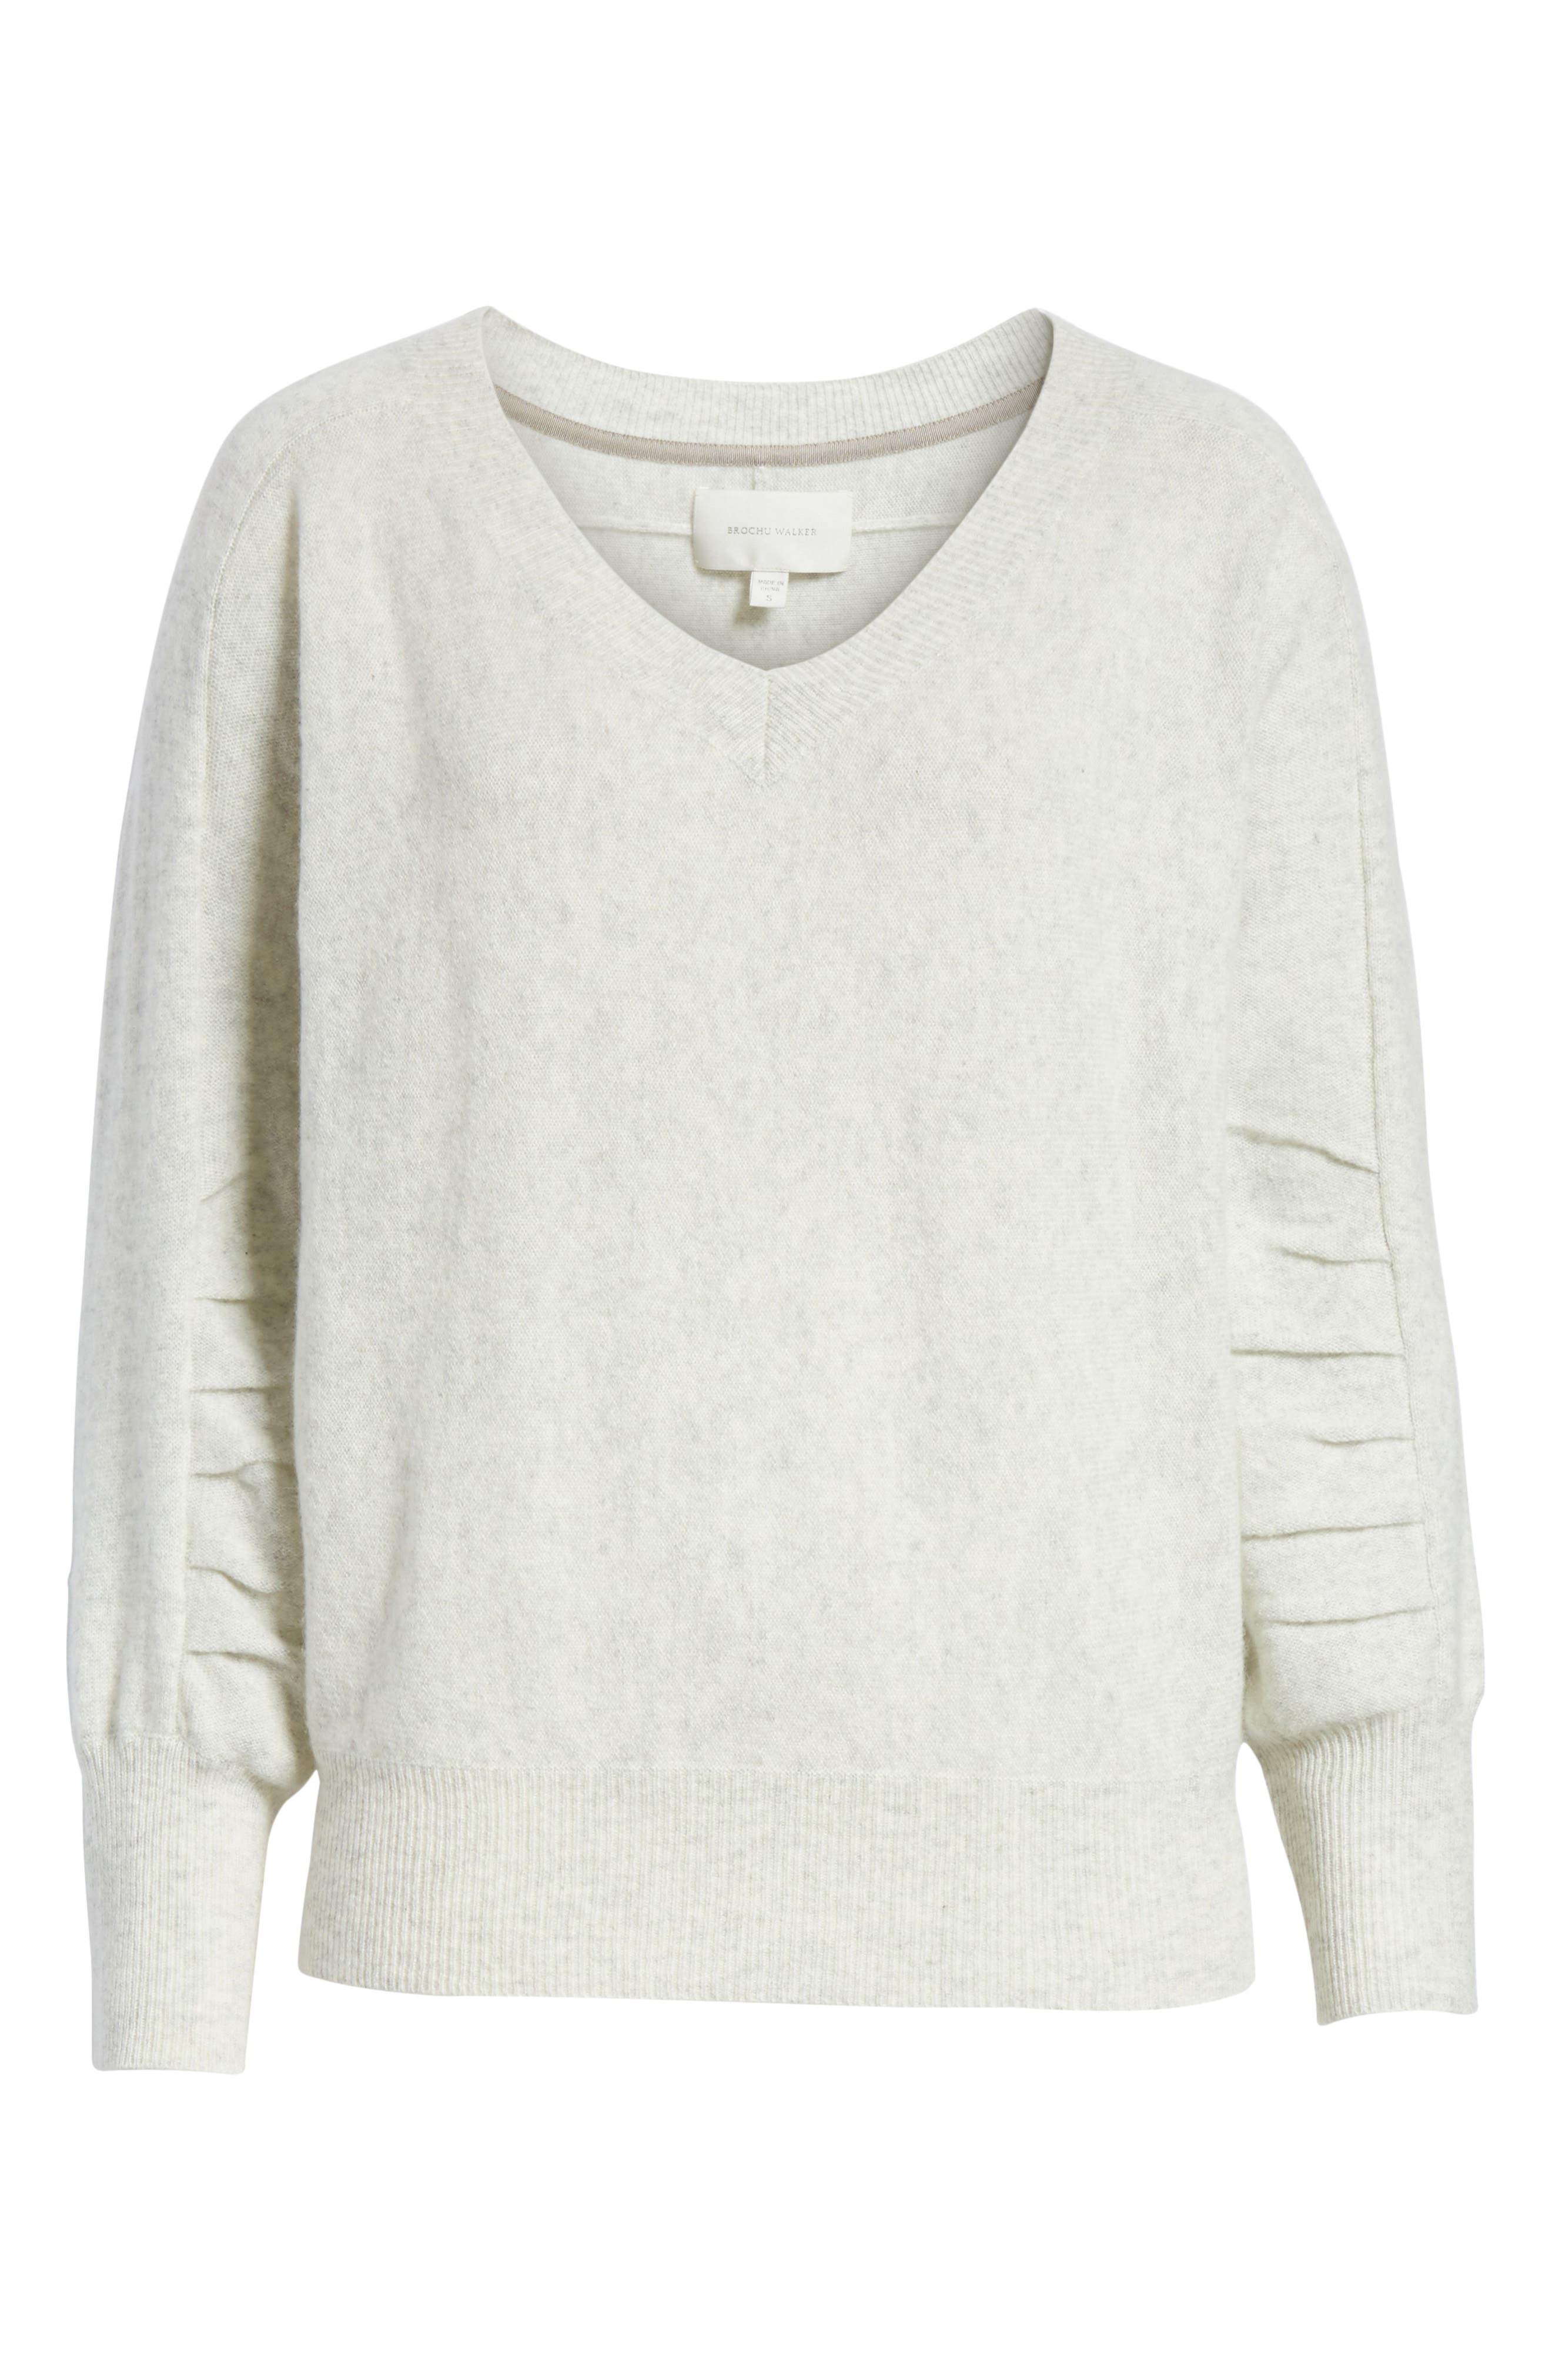 Weller Cashmere Sweater,                             Alternate thumbnail 6, color,                             100